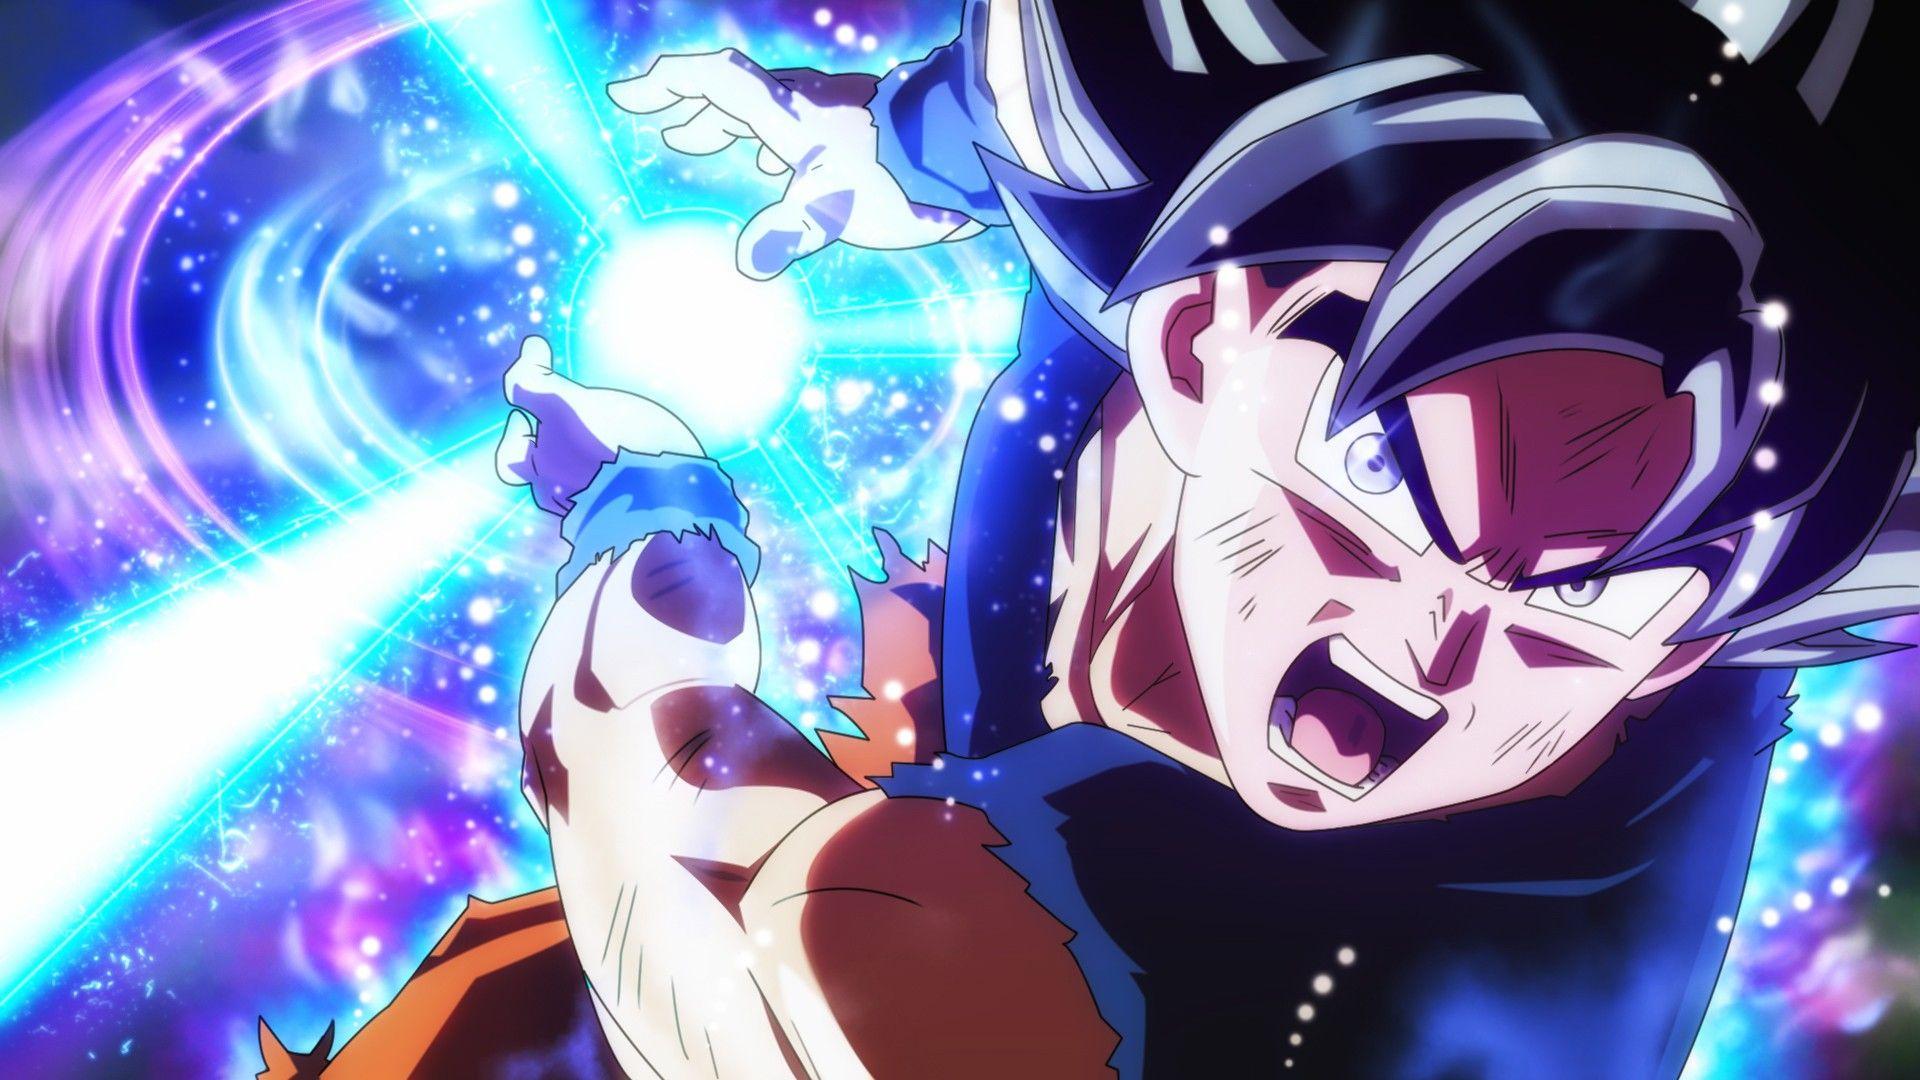 Luxury Goku New Ultra Instinct Wallpaper Goku Dragon Ball Dragon